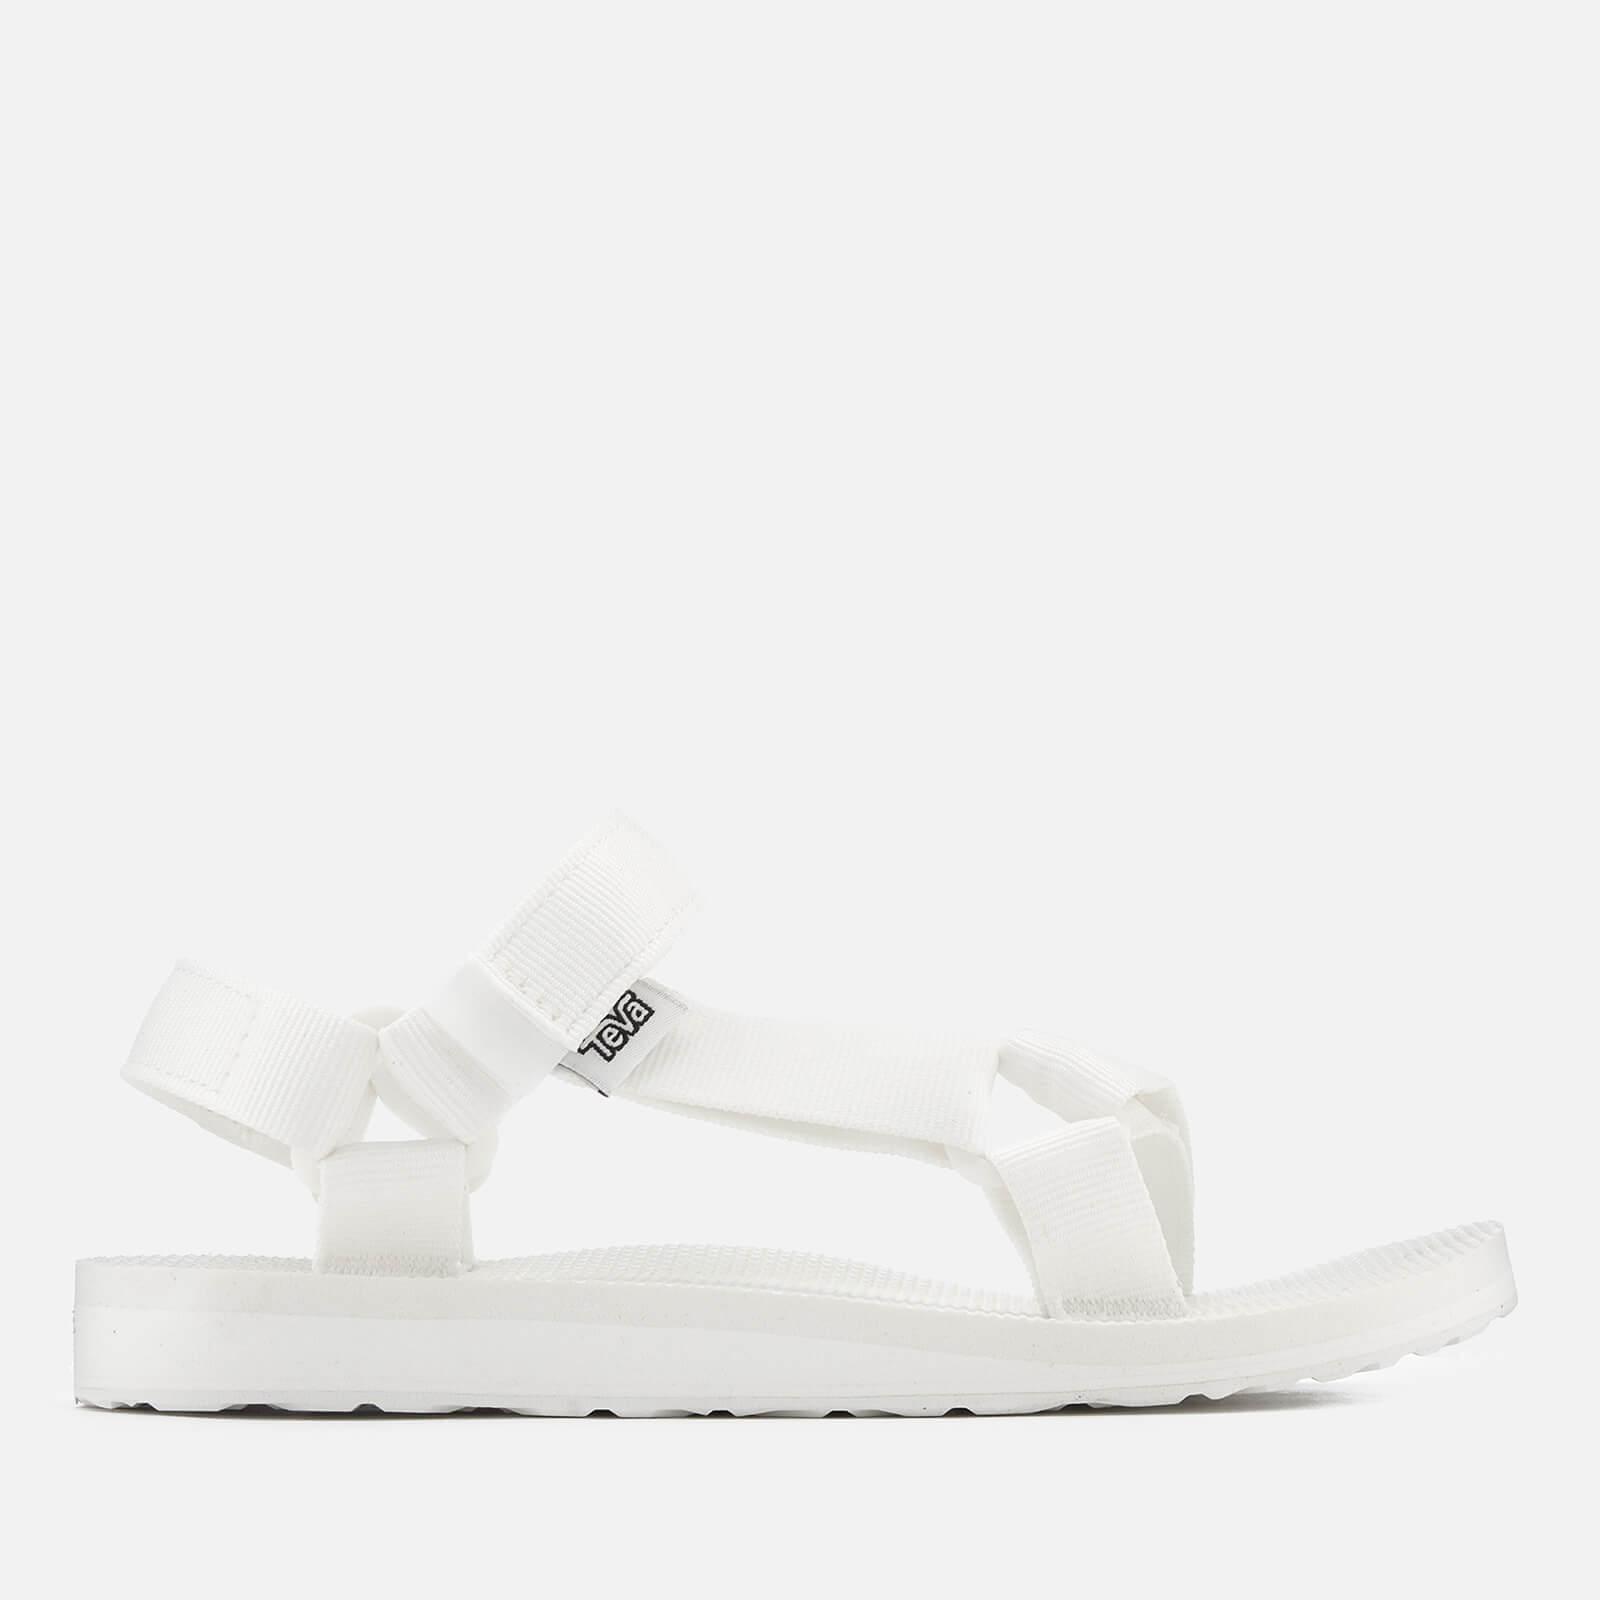 Teva Women's Original Universal Sport Sandals - Bright White - UK 5